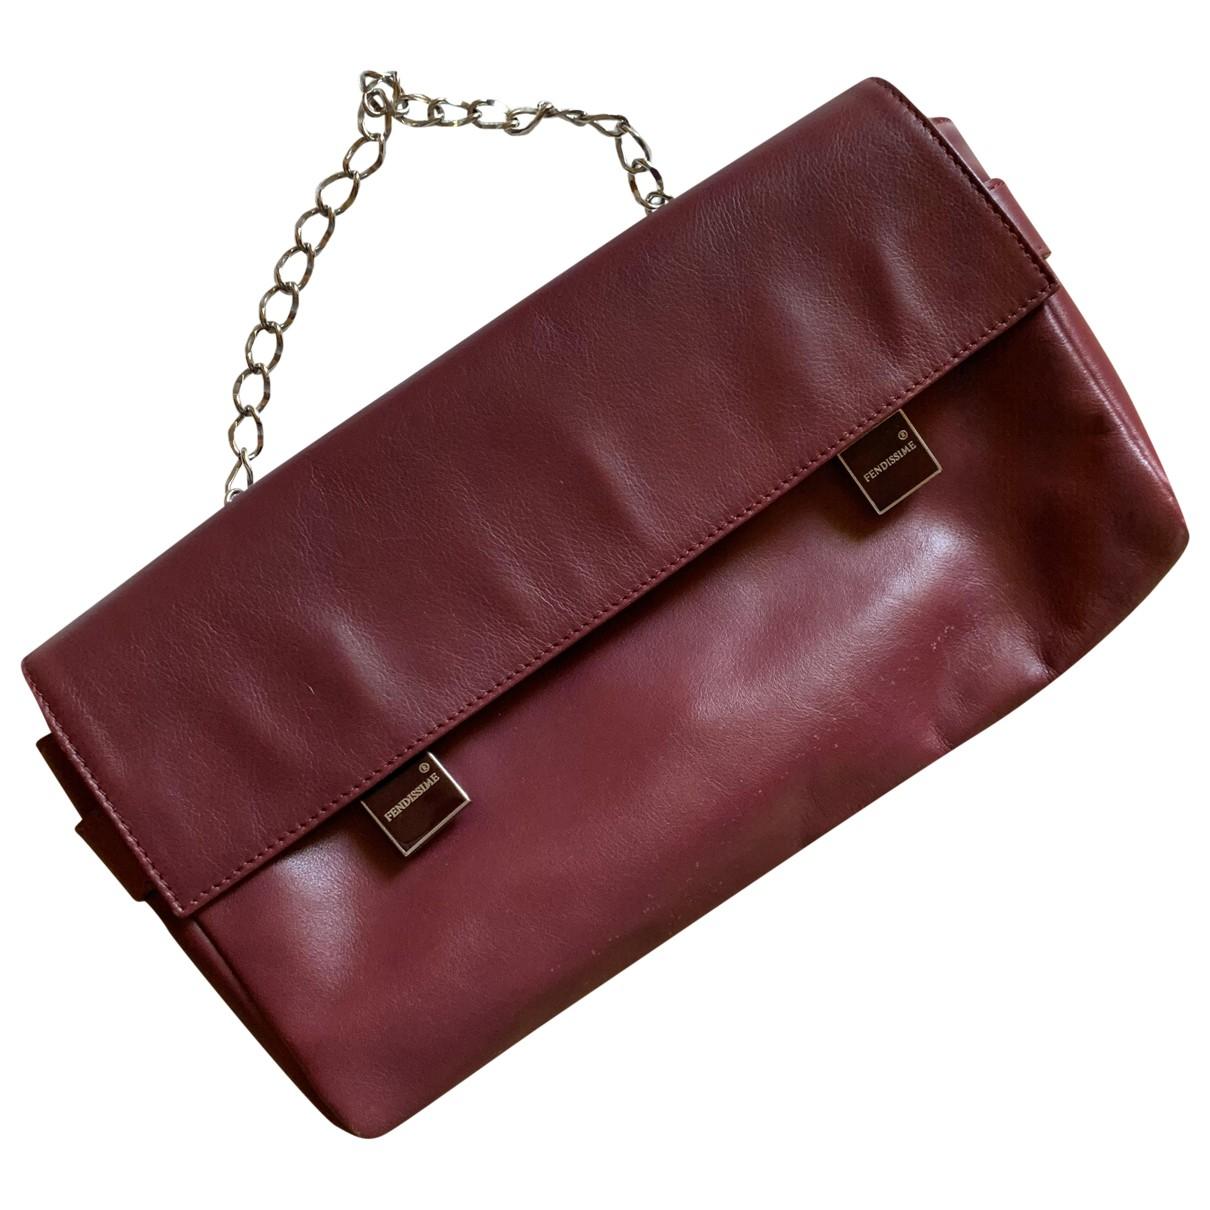 Fendissime \N Handtasche in  Bordeauxrot Leder